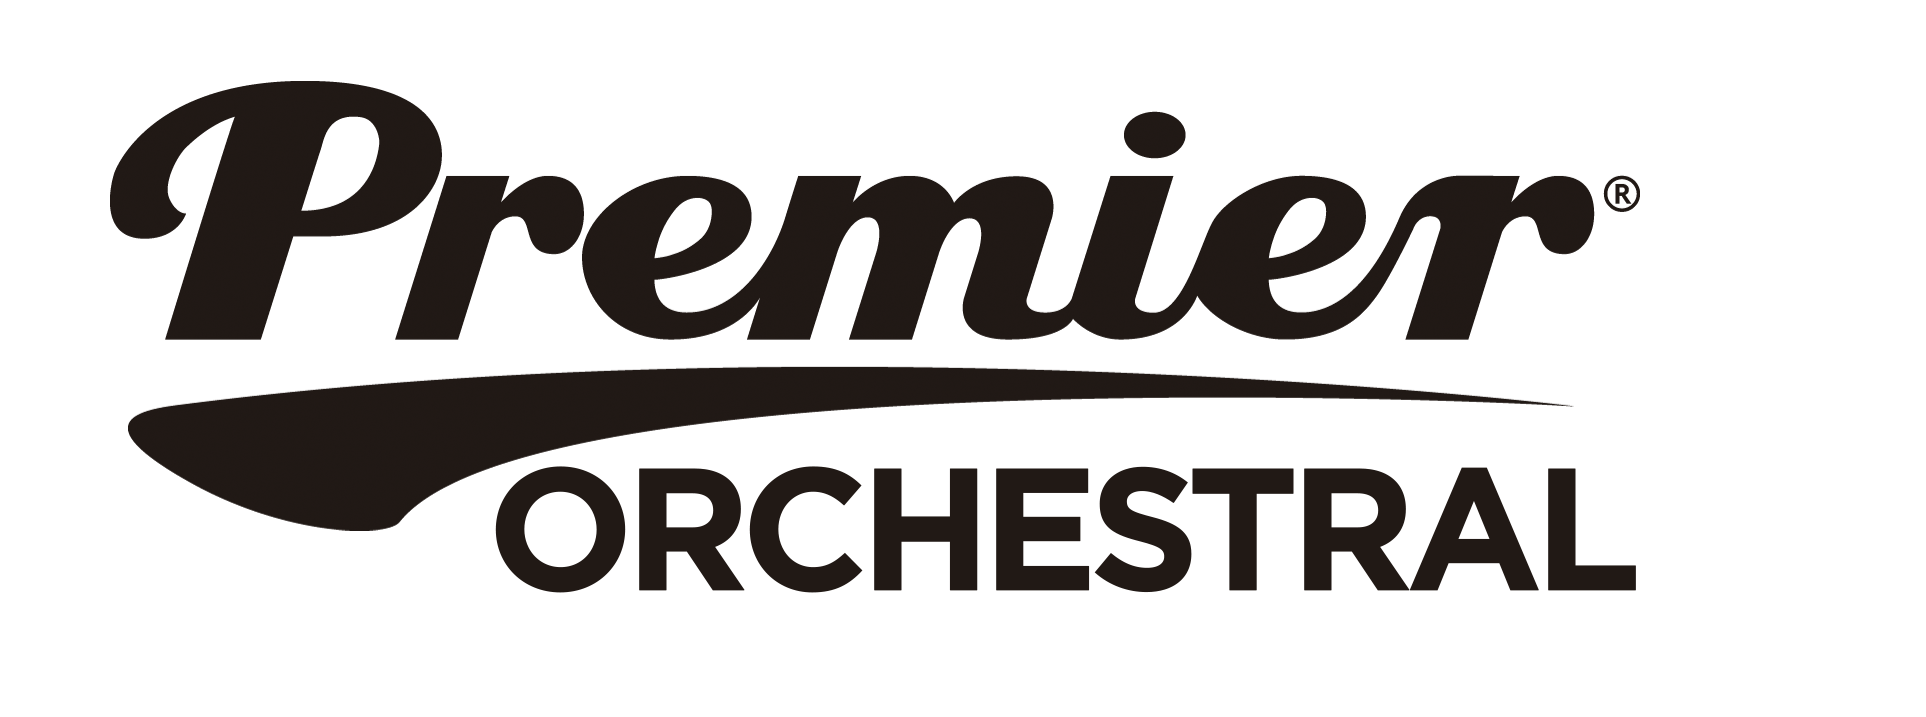 premier-orchestral